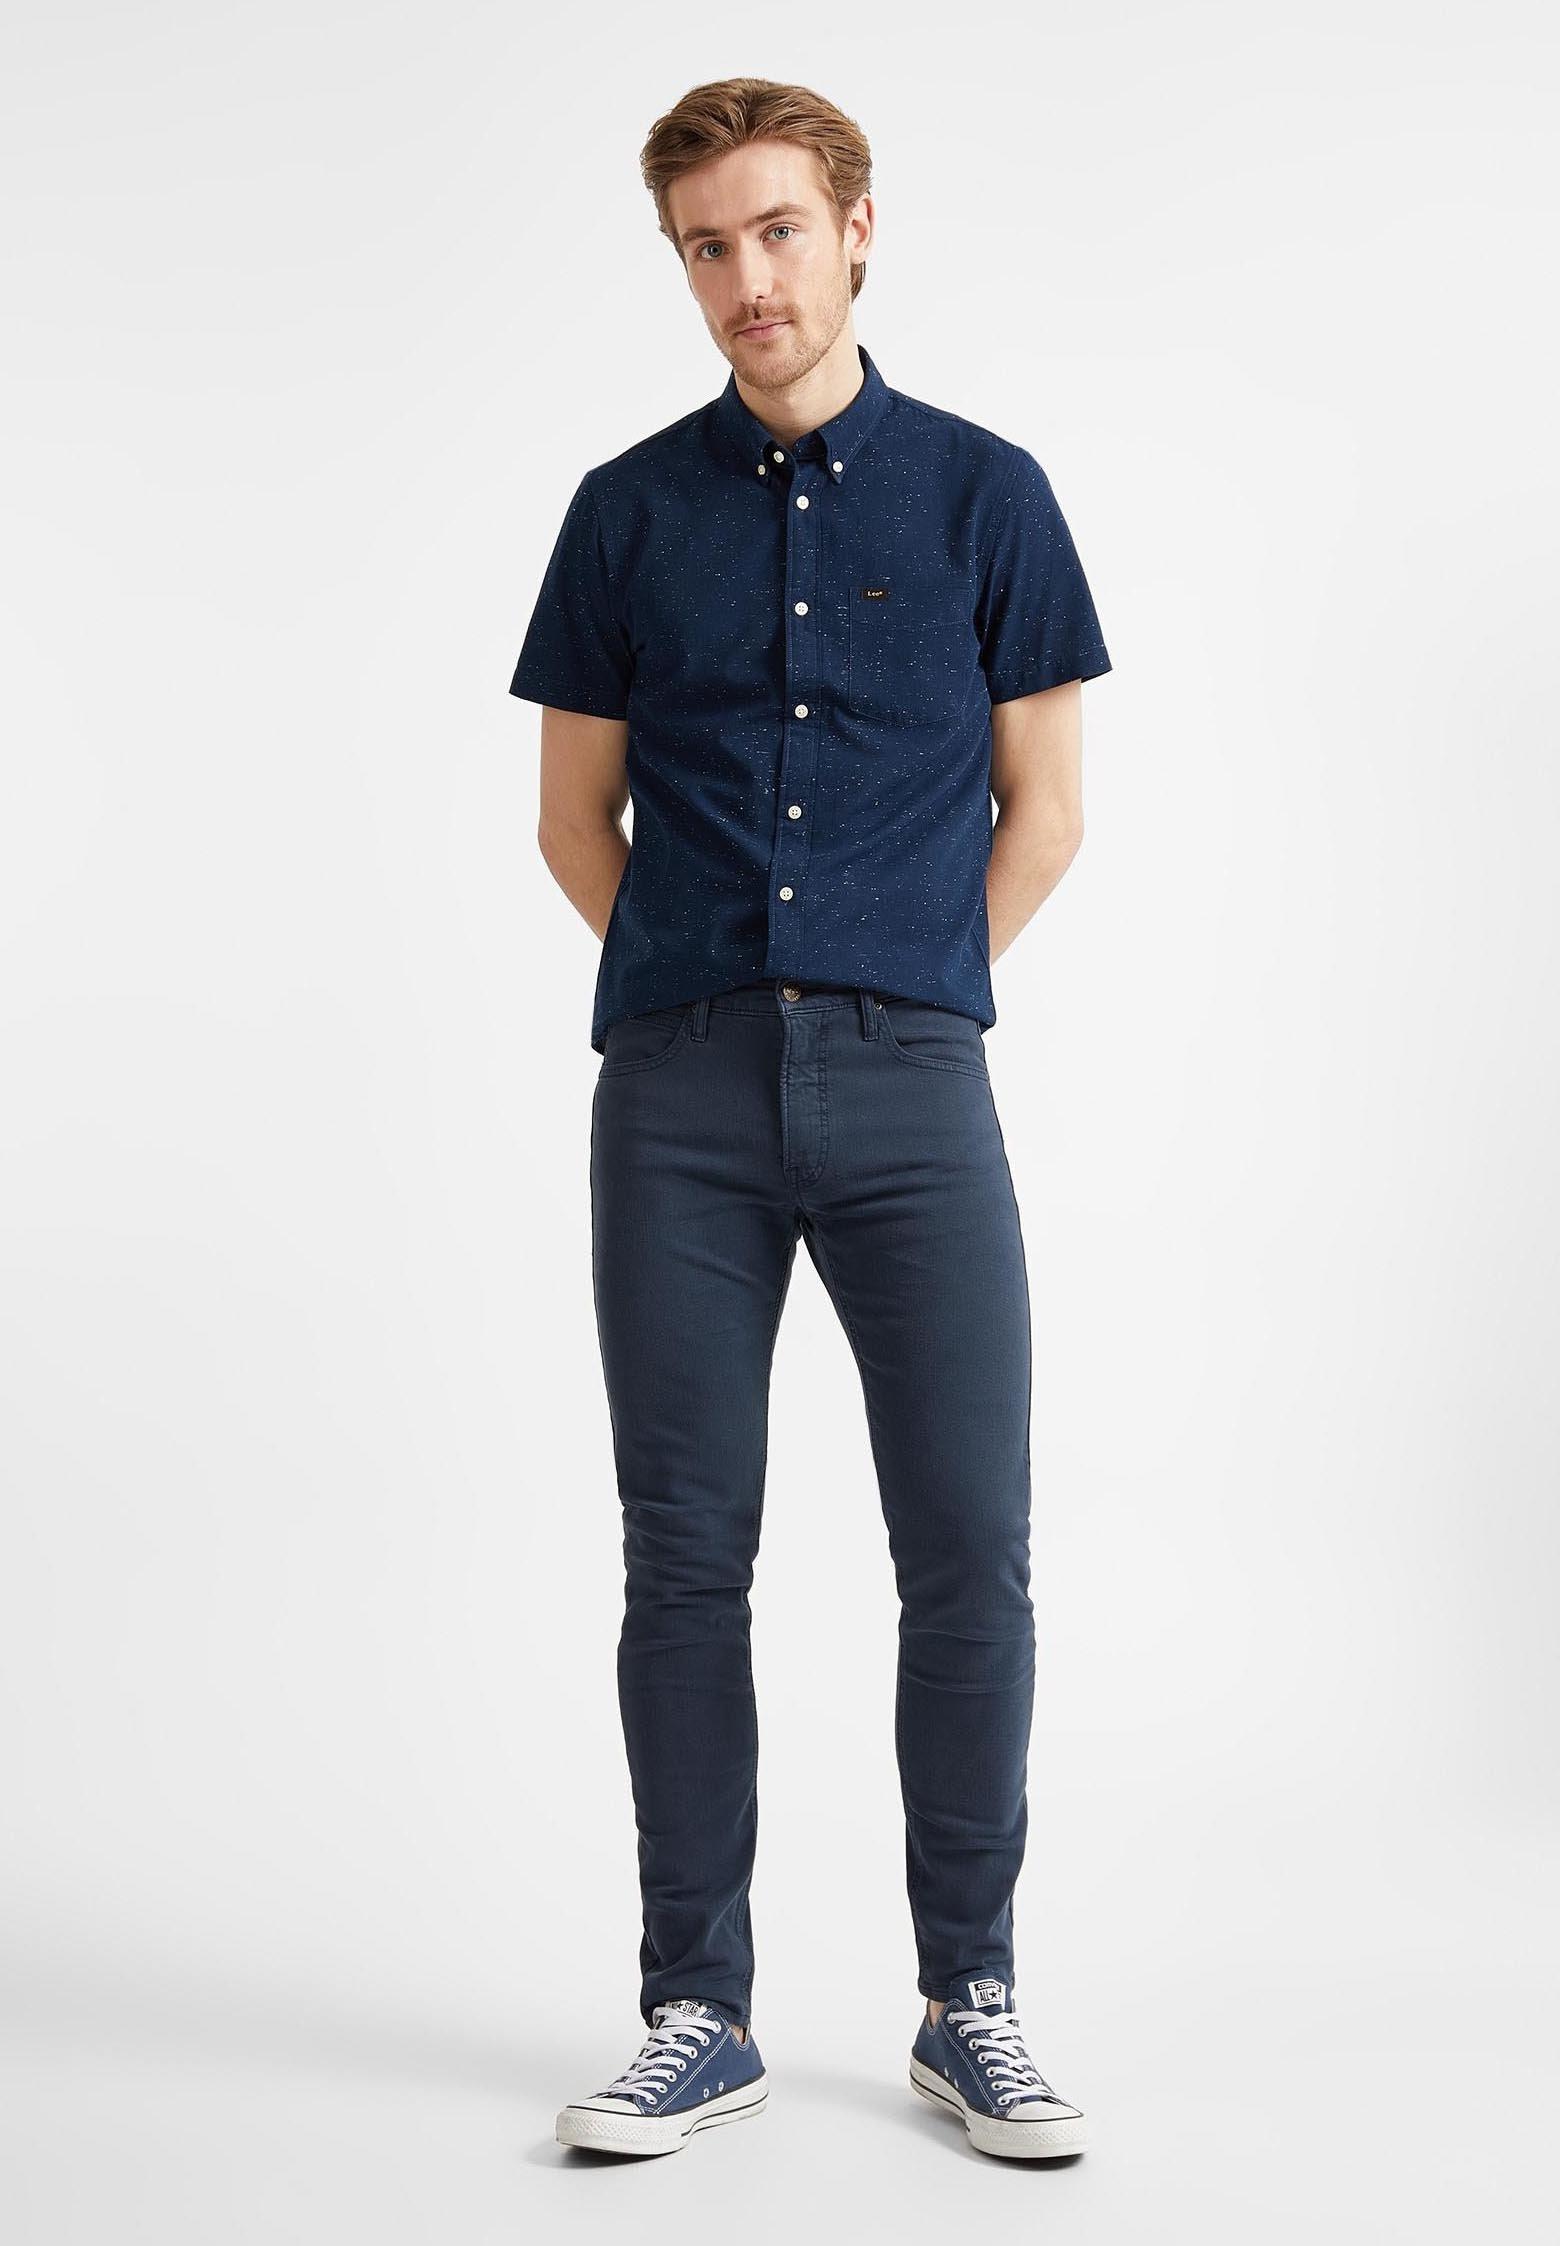 Lee Luke - Jeans Slim Fit Sky Captain nBxPB